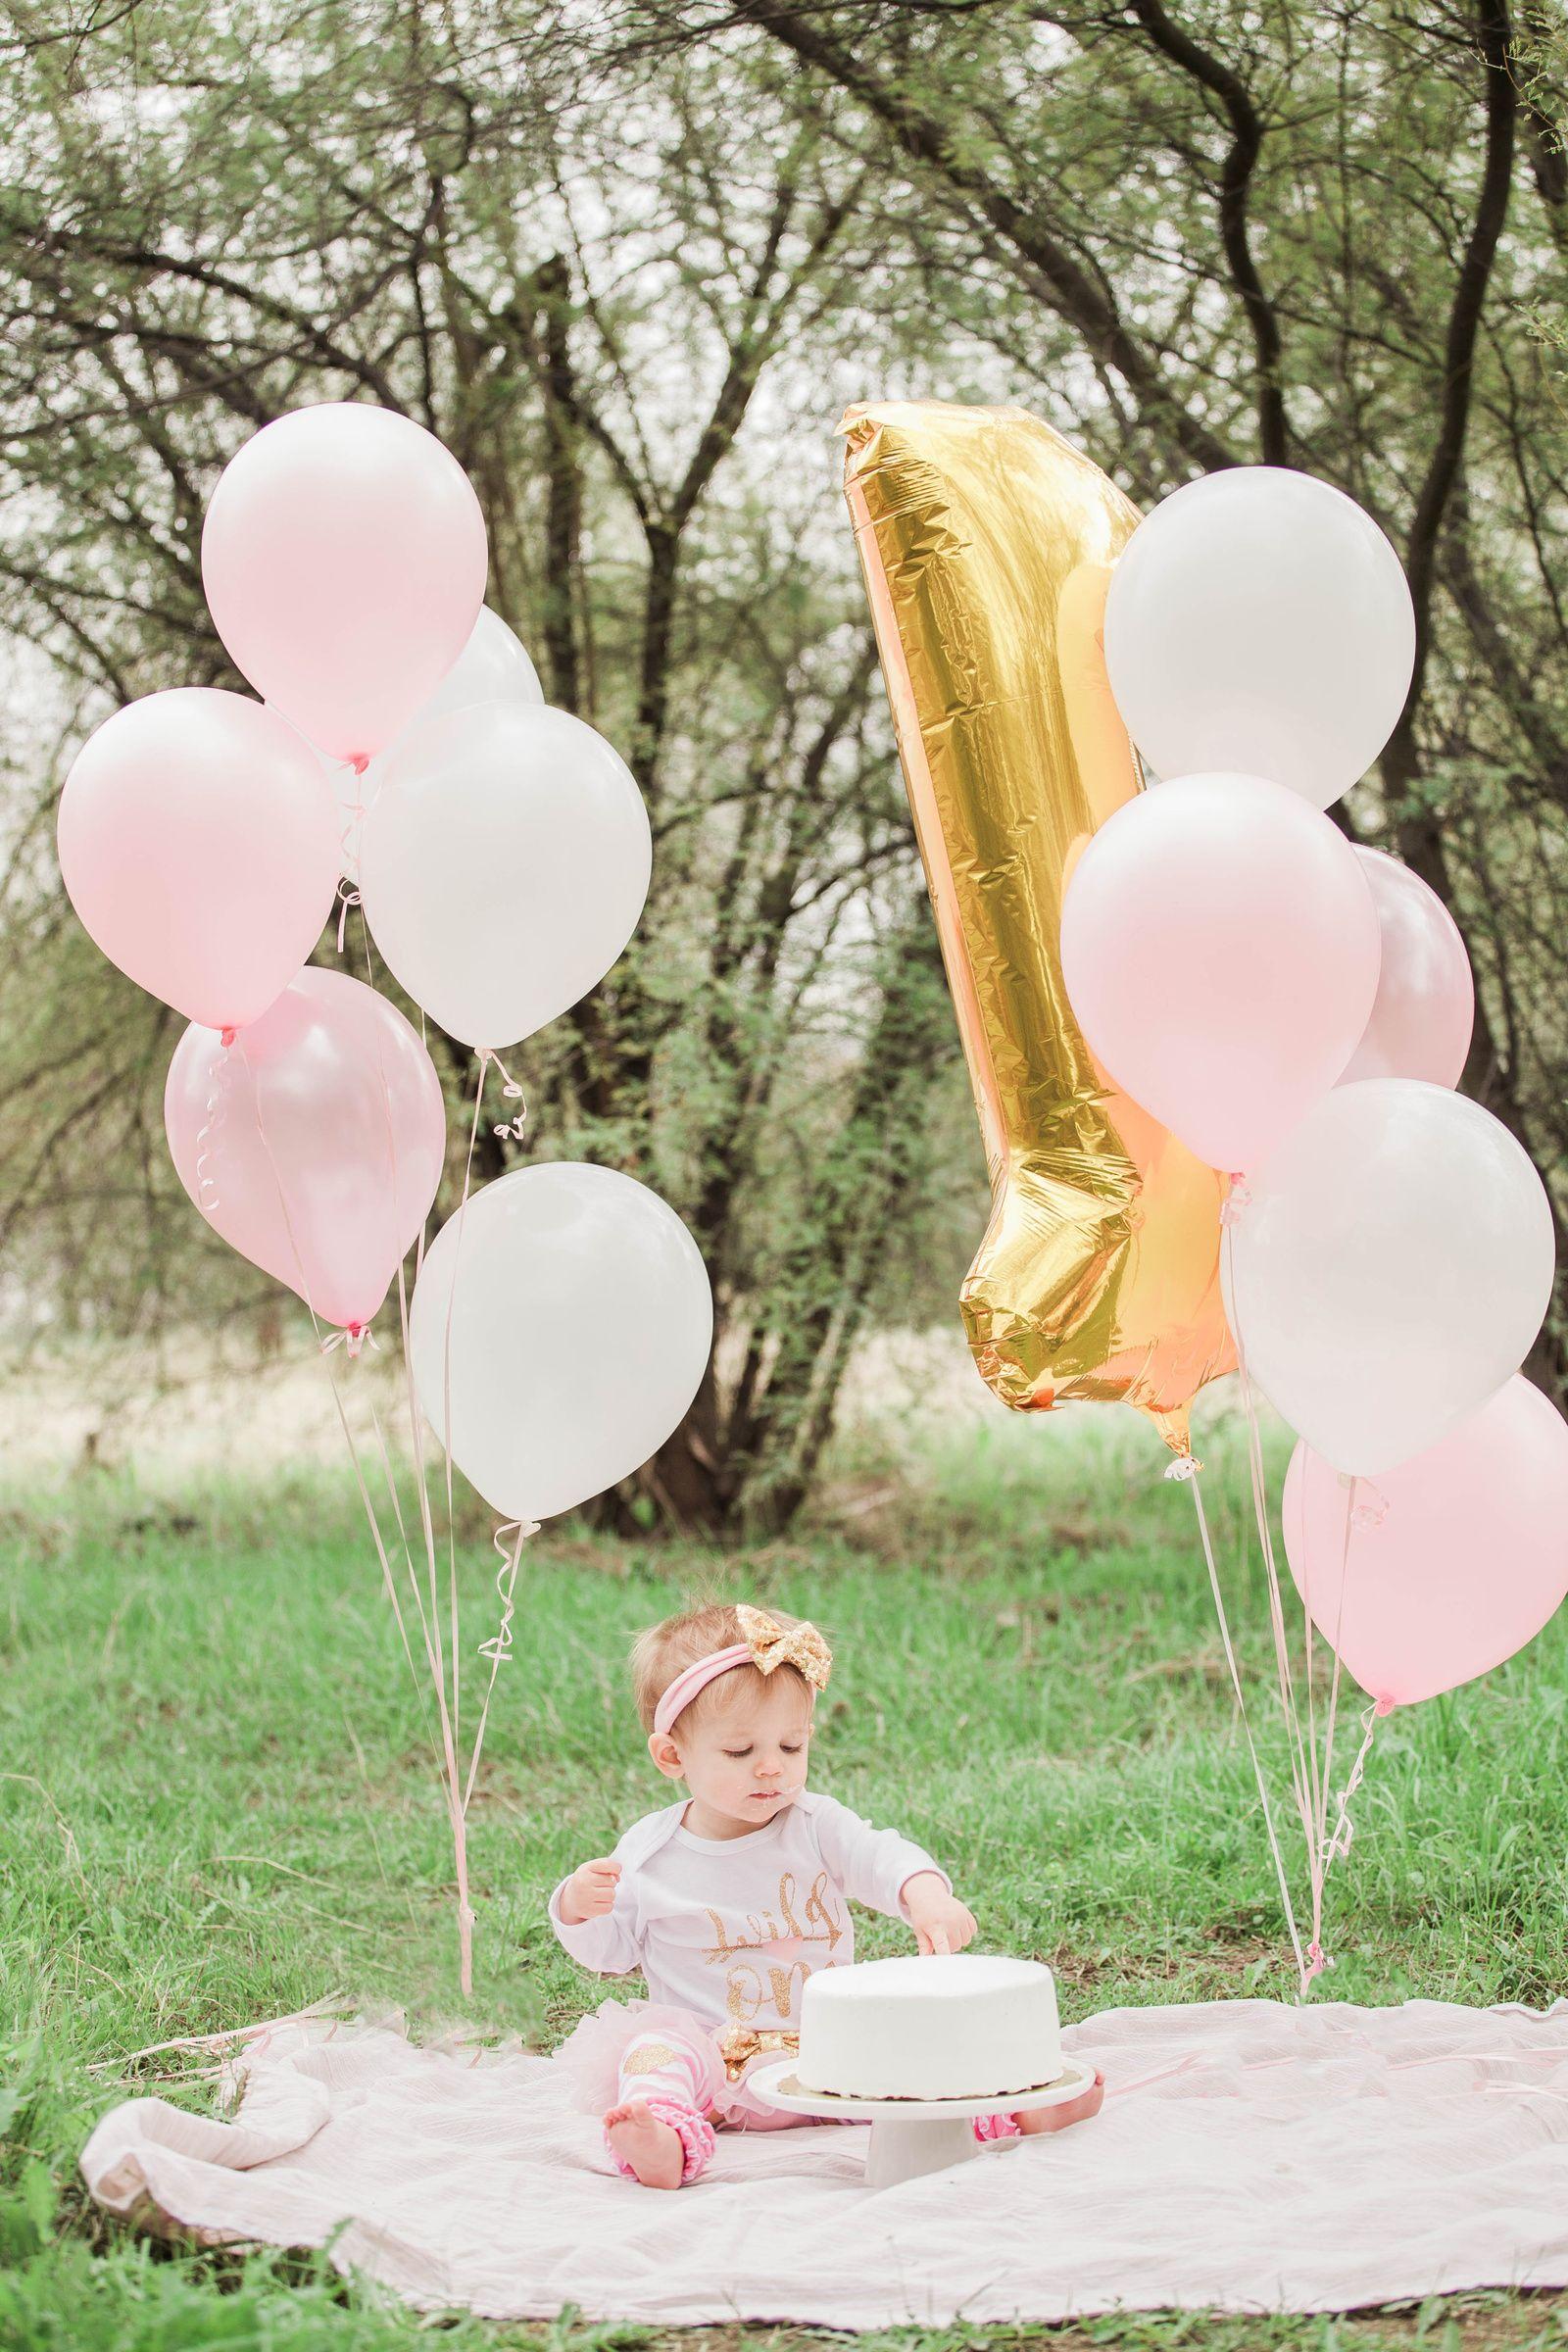 Smash Cake Set Hers One Year Old Girl Birthday Outfit Mint and Gold Birthday Outfit First Birthday Party 1 Year Old Girl Birthday Outfit